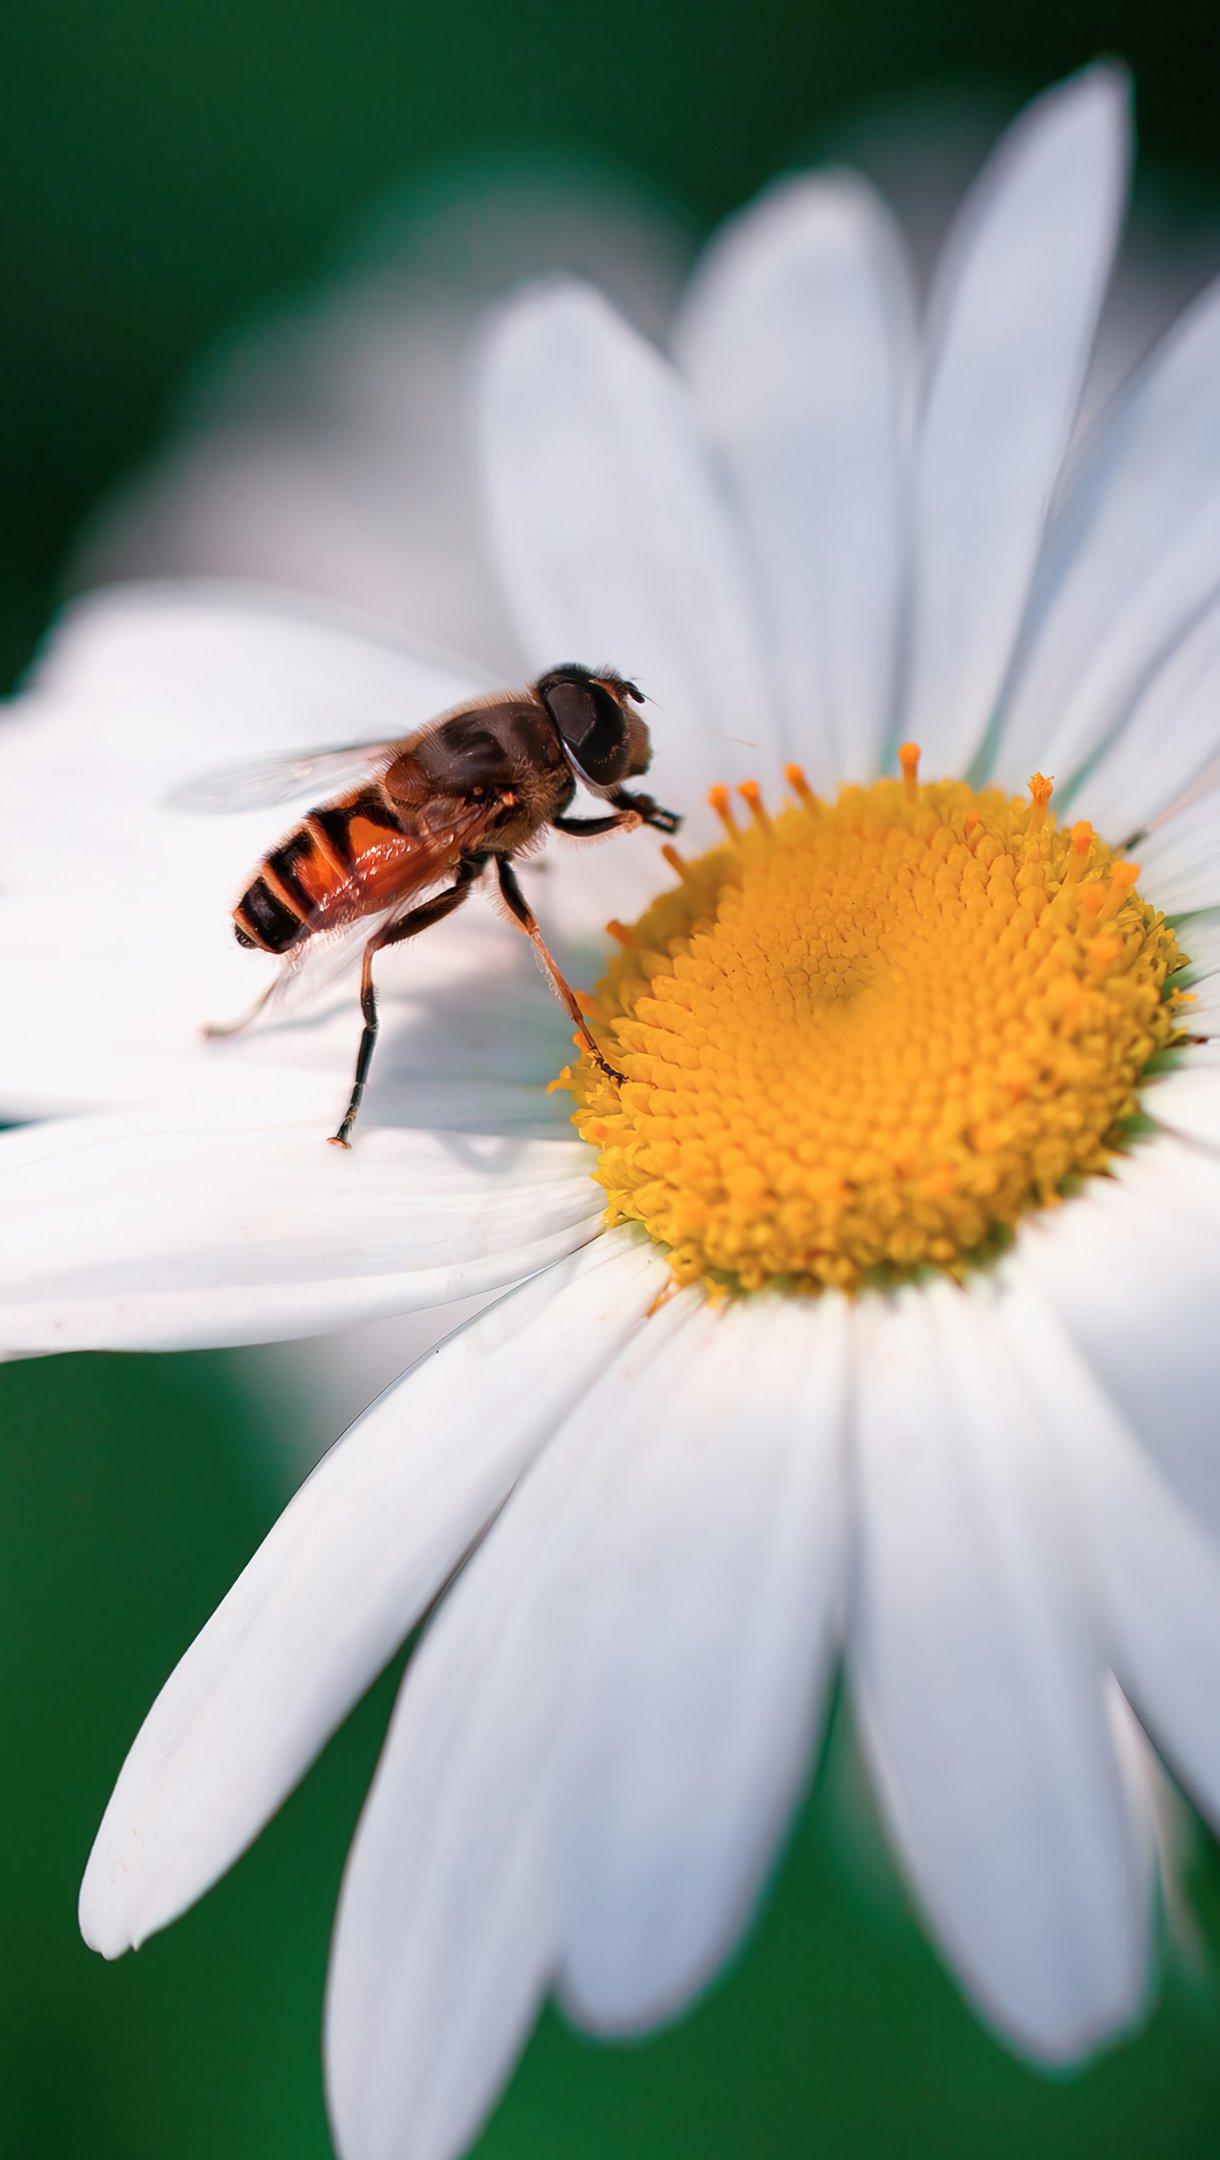 Wallpaper Bee on flower Vertical